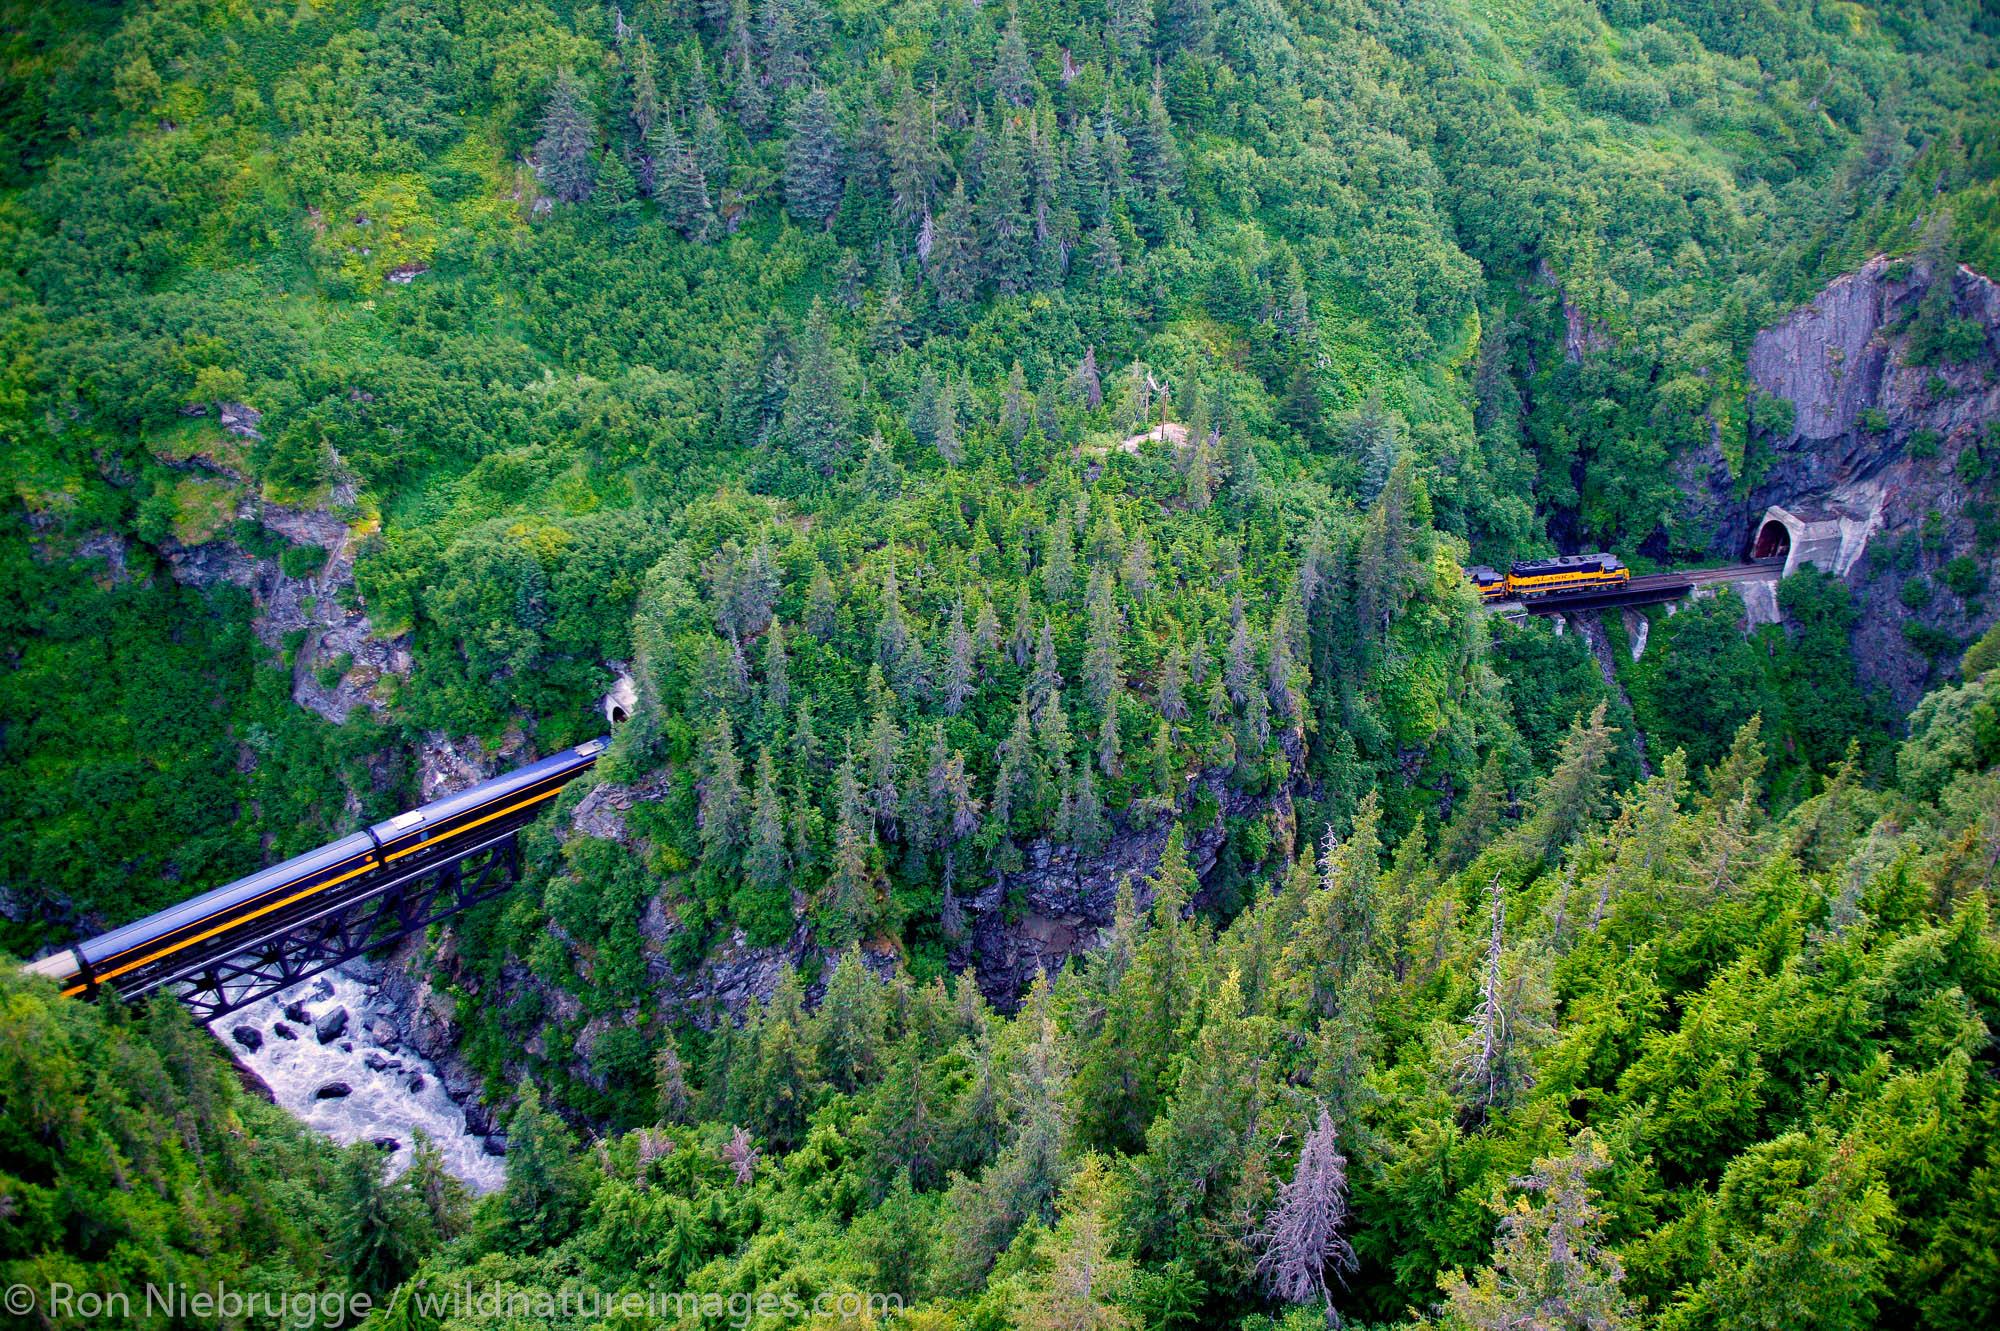 Alaska Railroad passes through tunnels in the Chugach National Forest, Kenai Peninsula on its way between Seward and Anchorage...